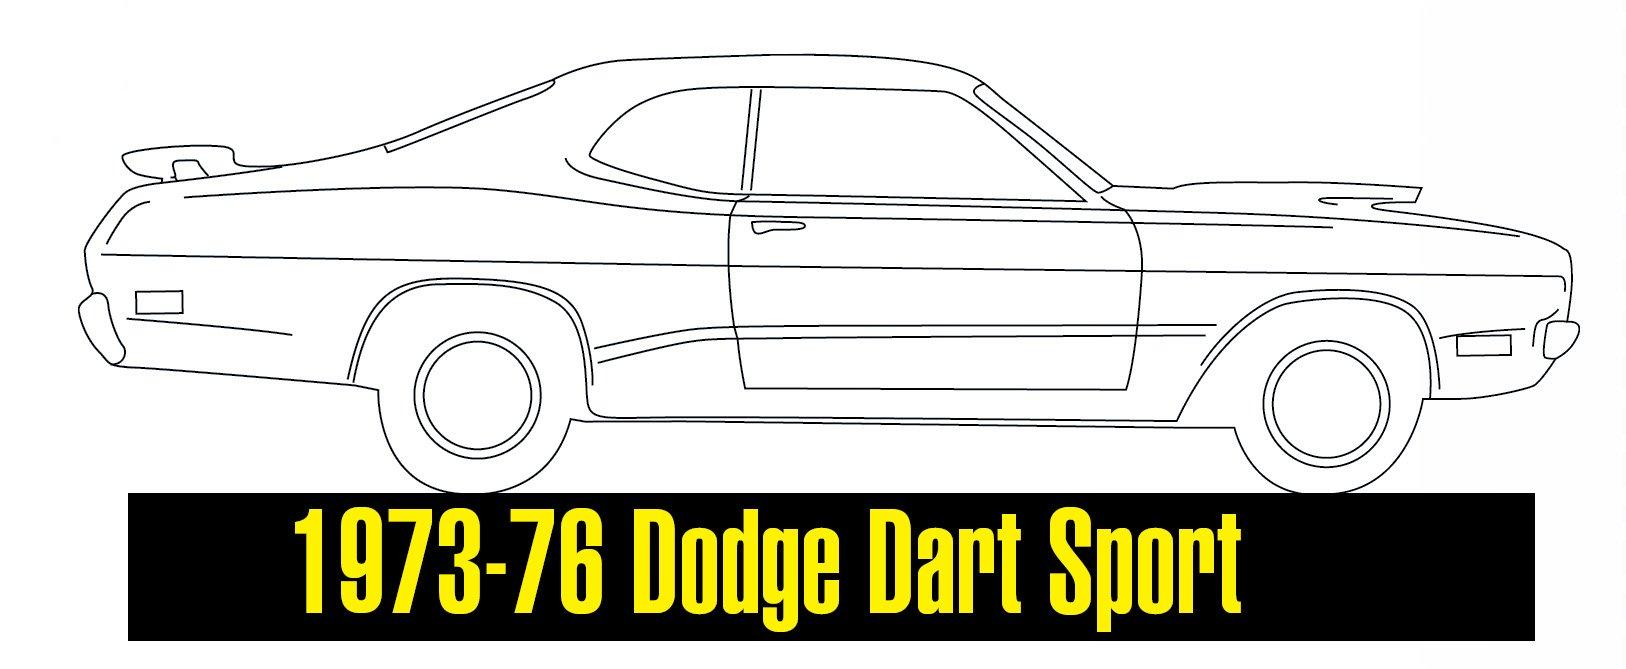 Classic_Dodge_73_Dart_Sport